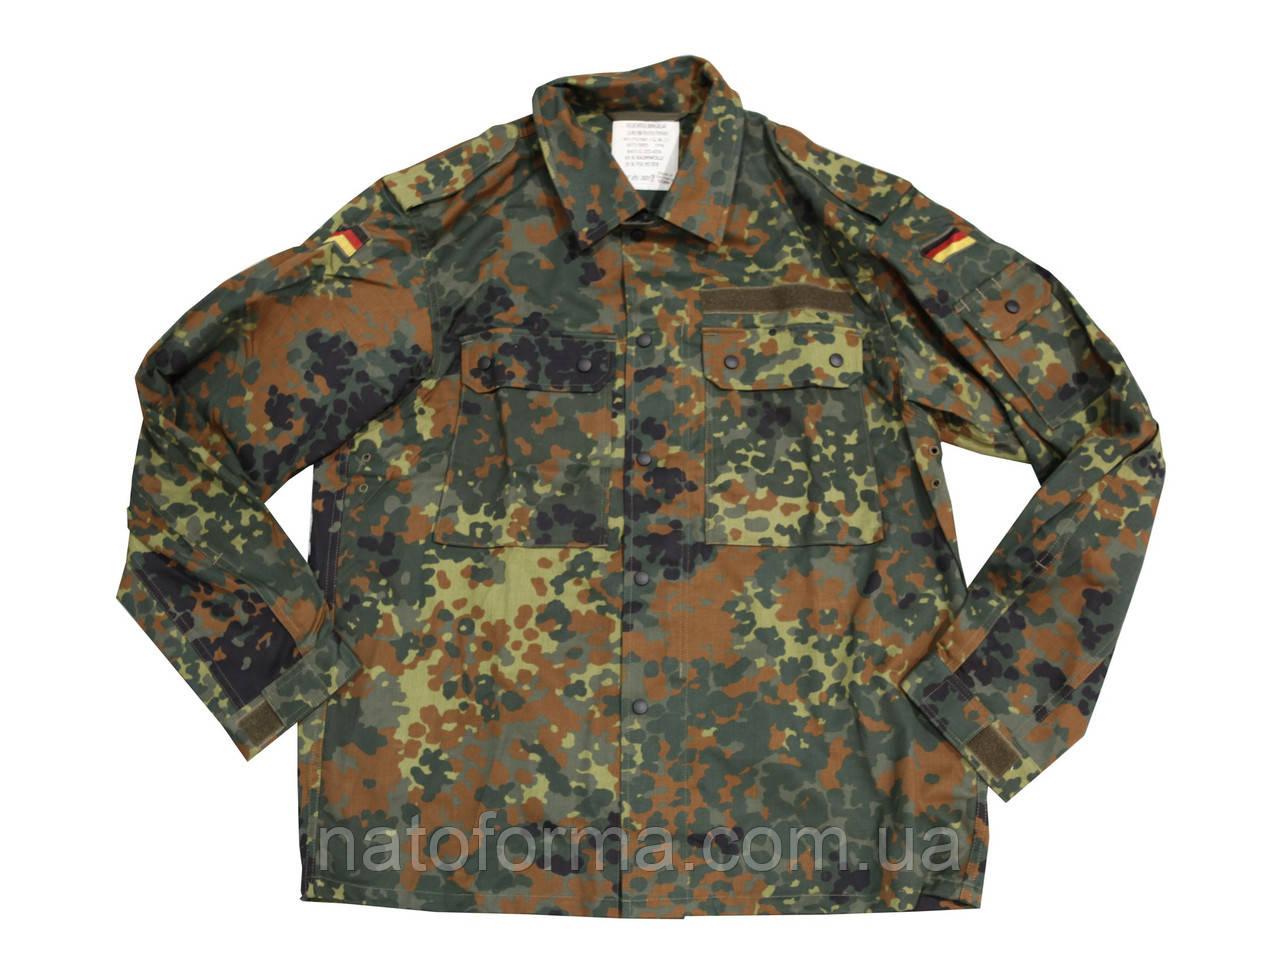 Китель, рубашка Flecktarn, армии Германии, оригинал